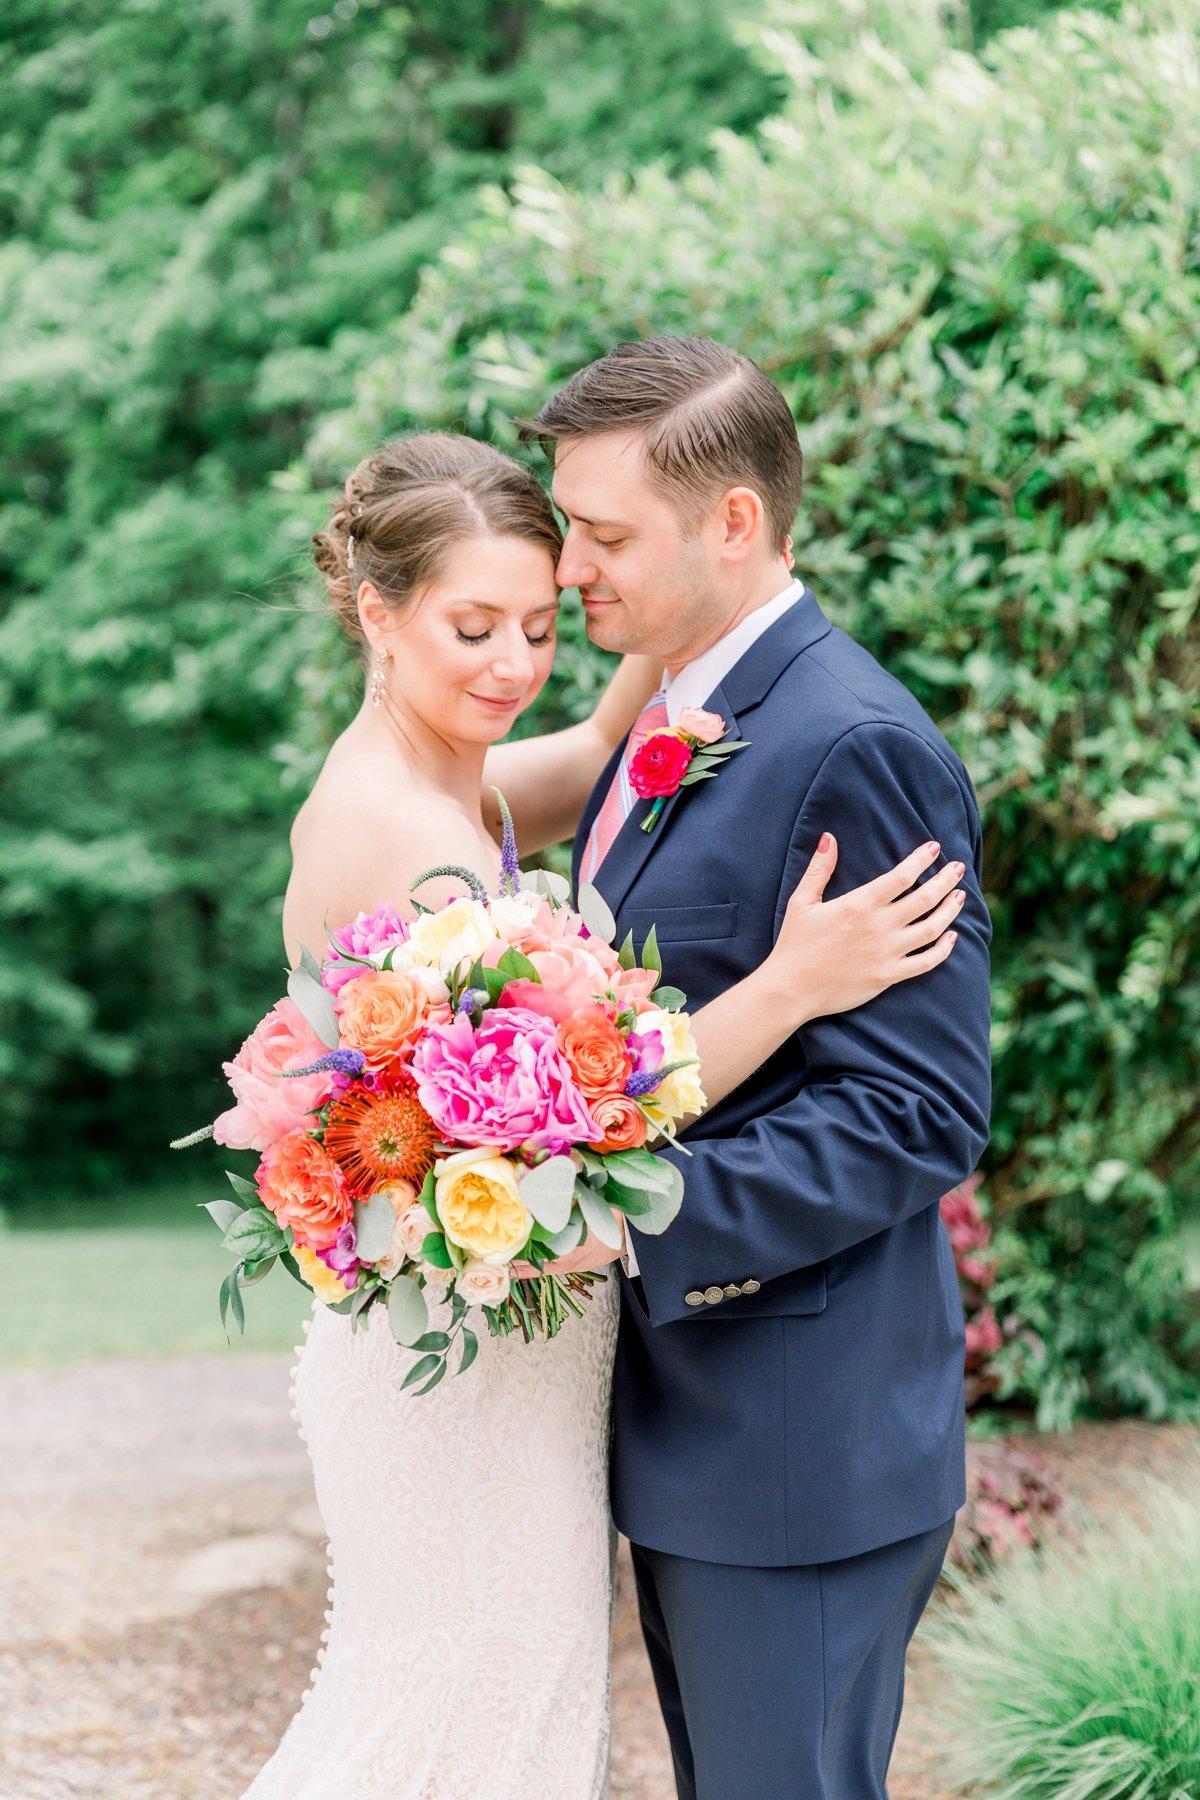 A Rustic & Colorful Ohio Wedding via TheELD.com